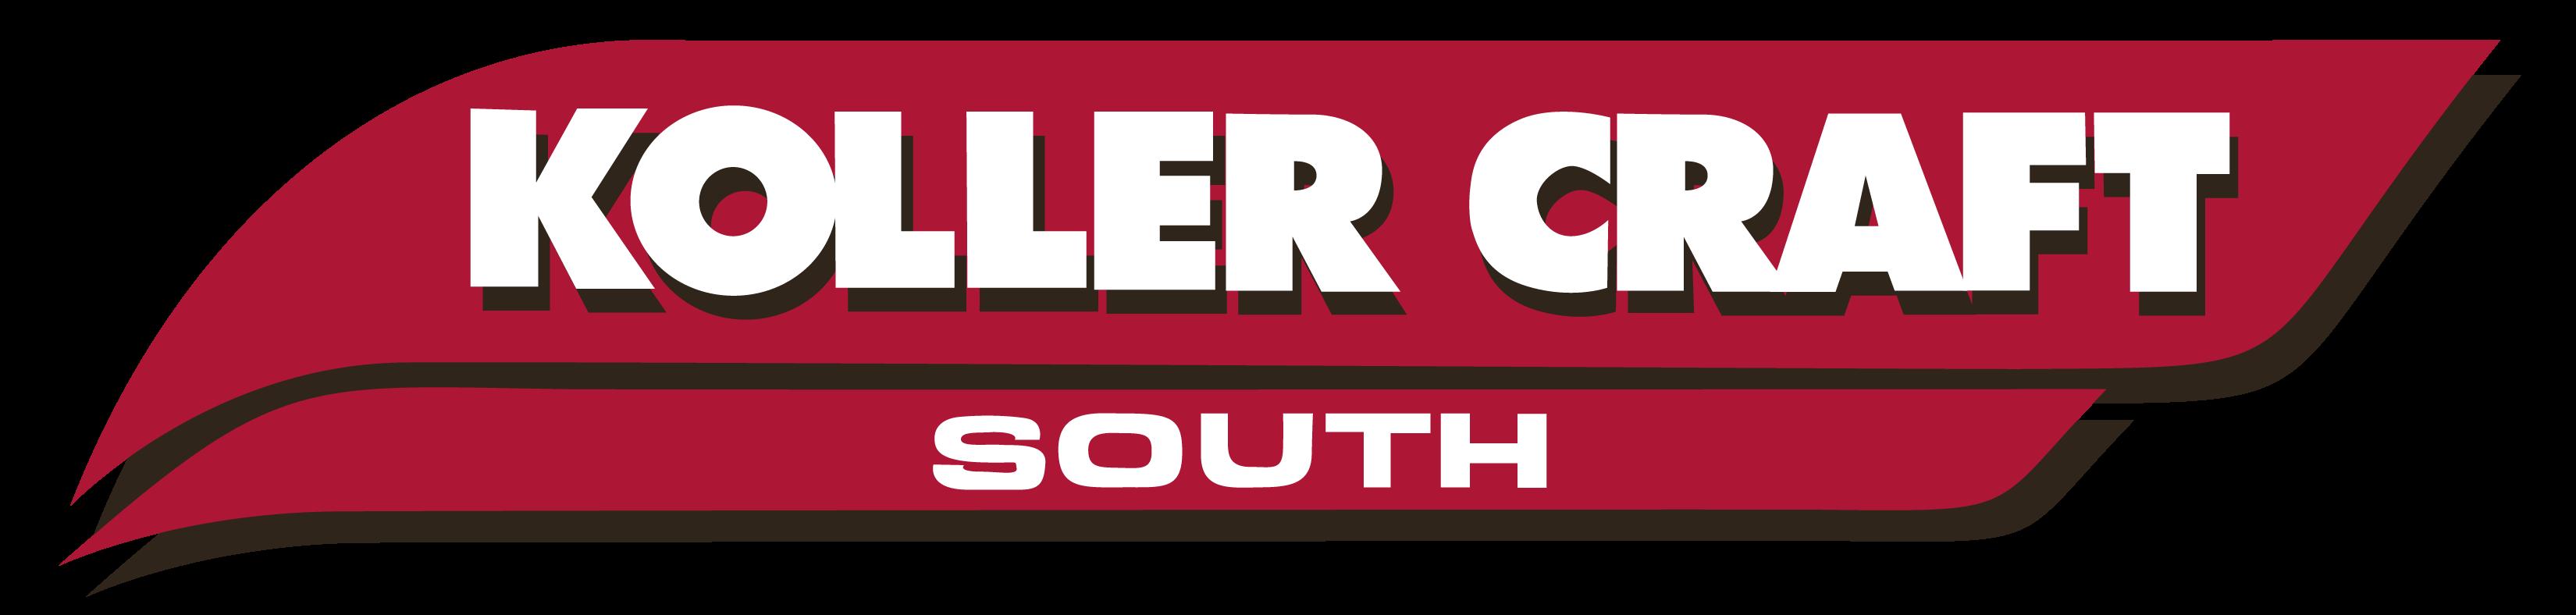 Koller Craft South